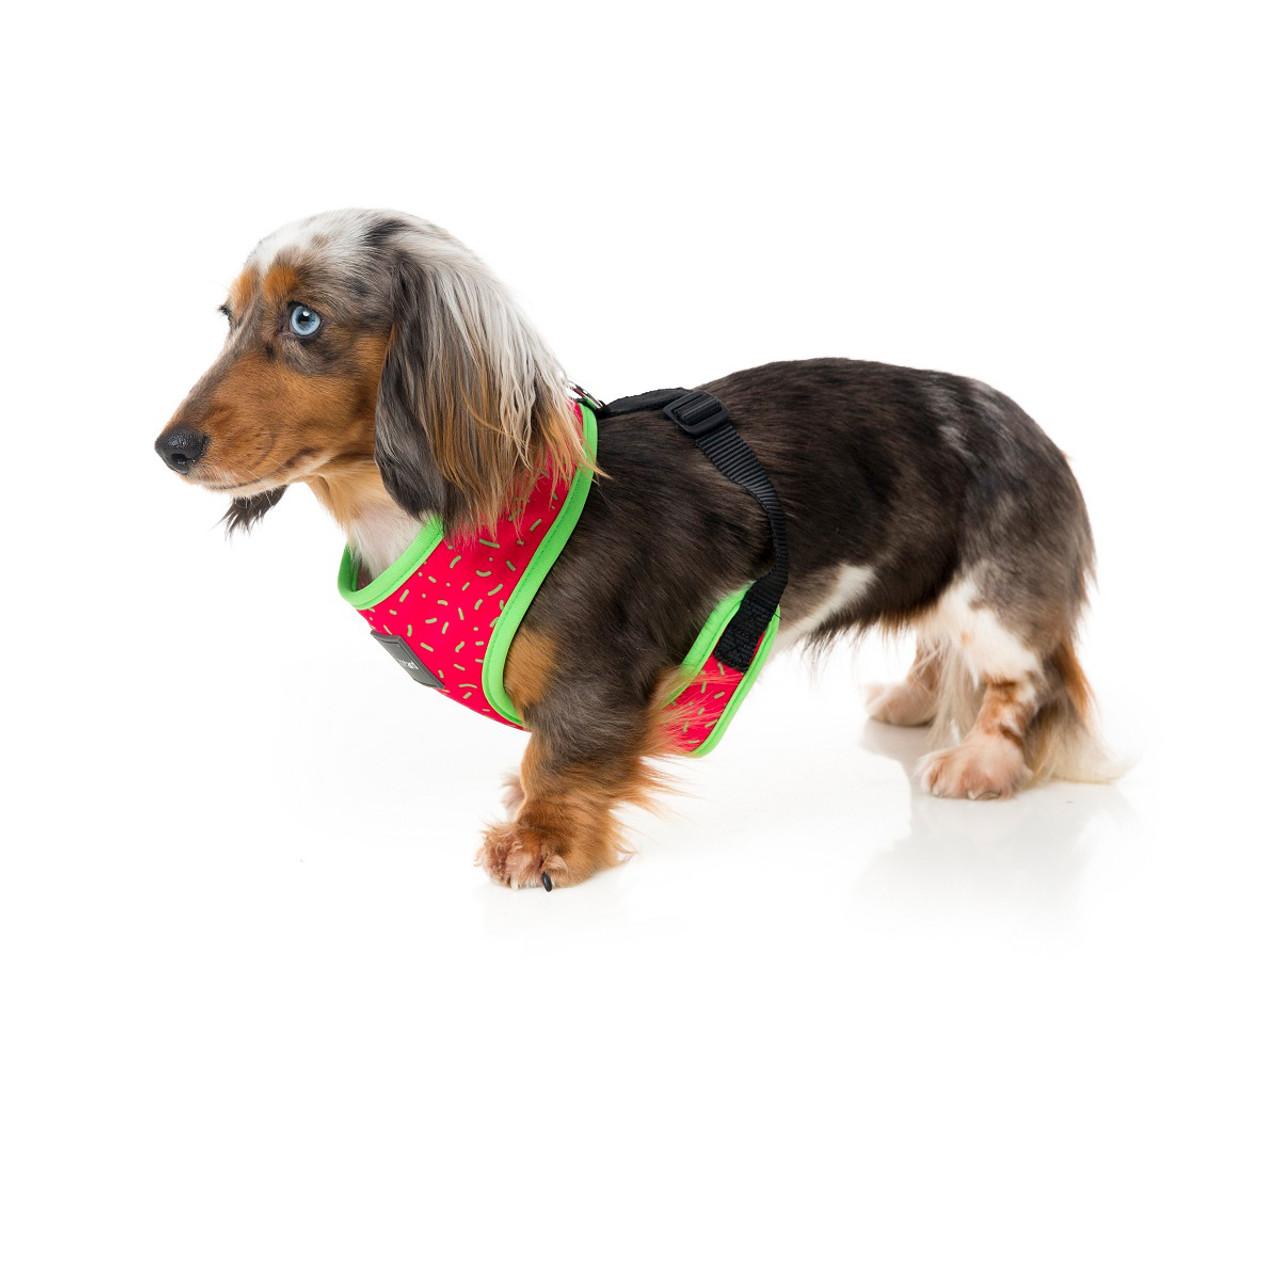 Fuzzyard Juicy Harness Dog